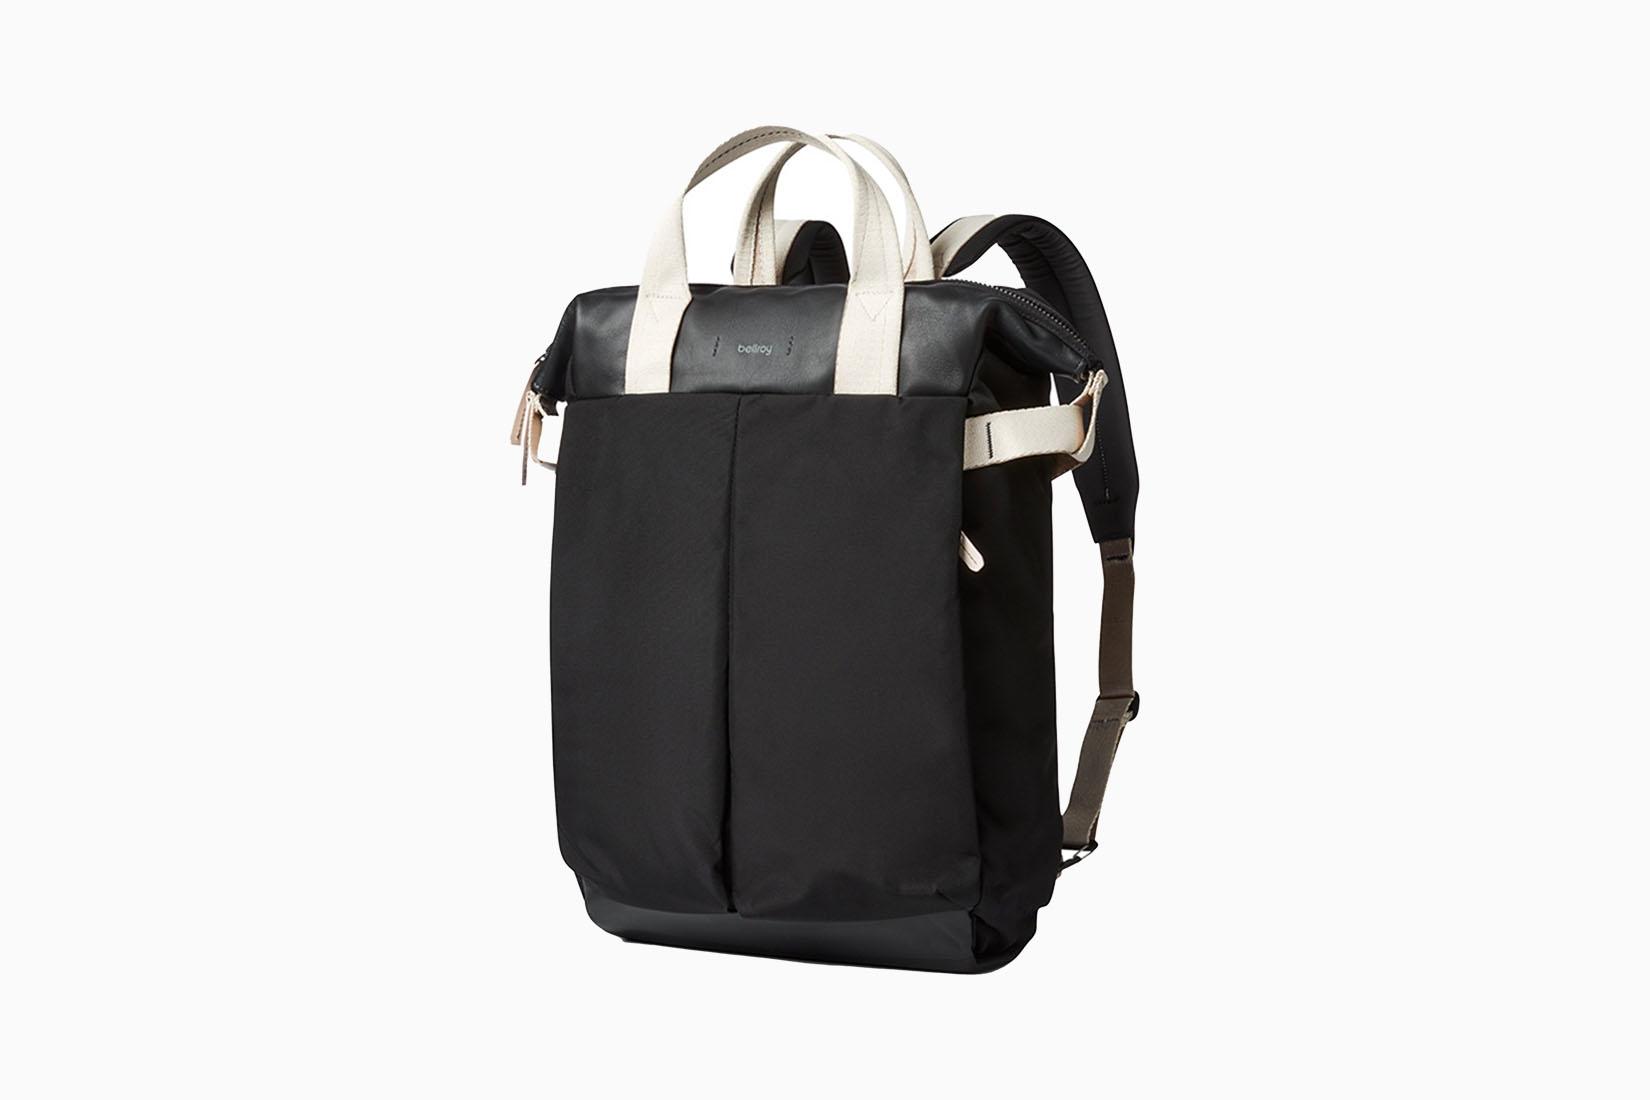 best backpacks women bellroy review Luxe Digital